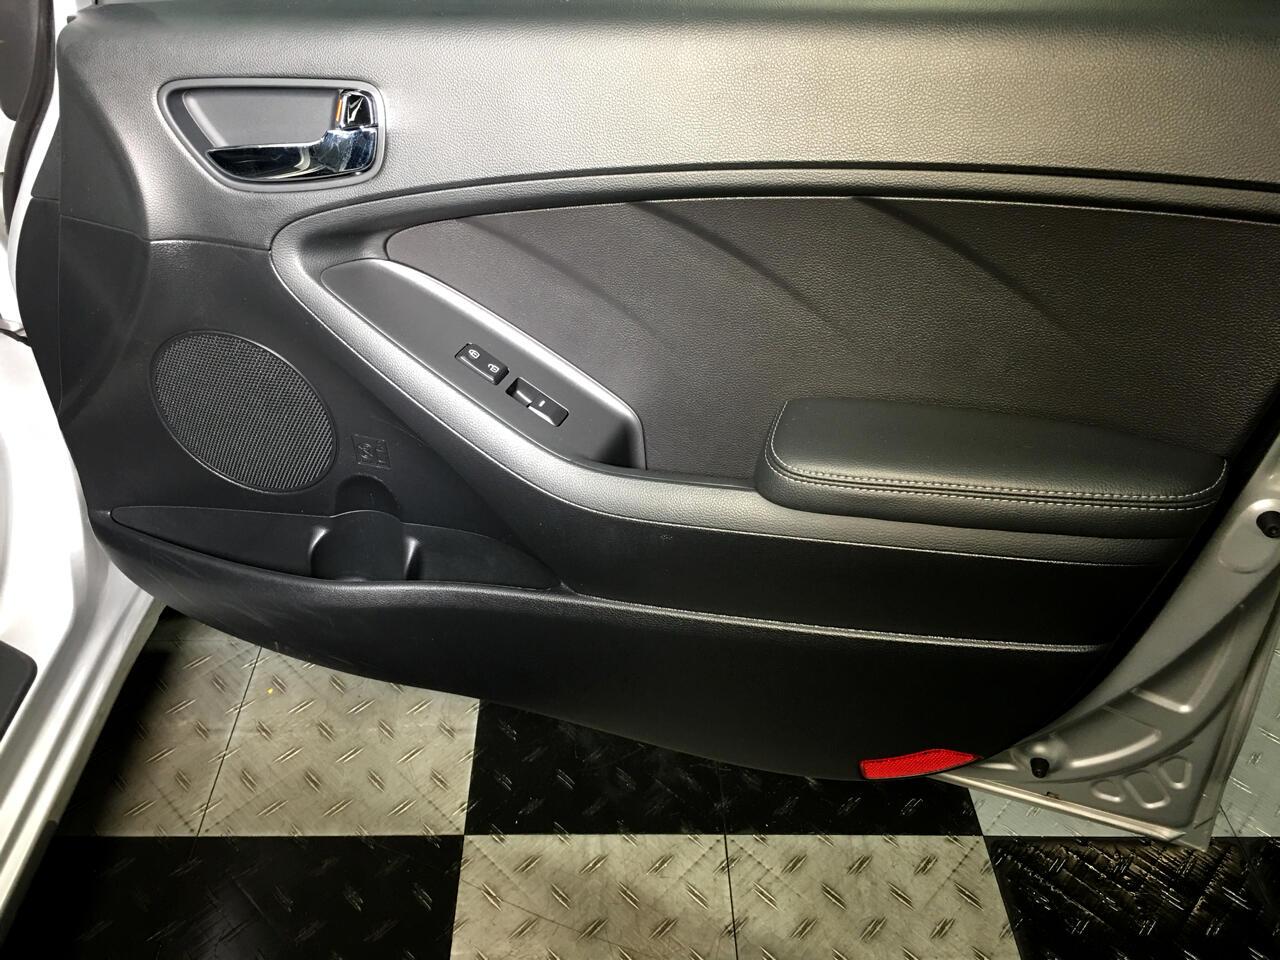 Pre-Owned 2016 Kia Forte 4dr Sdn Man LX